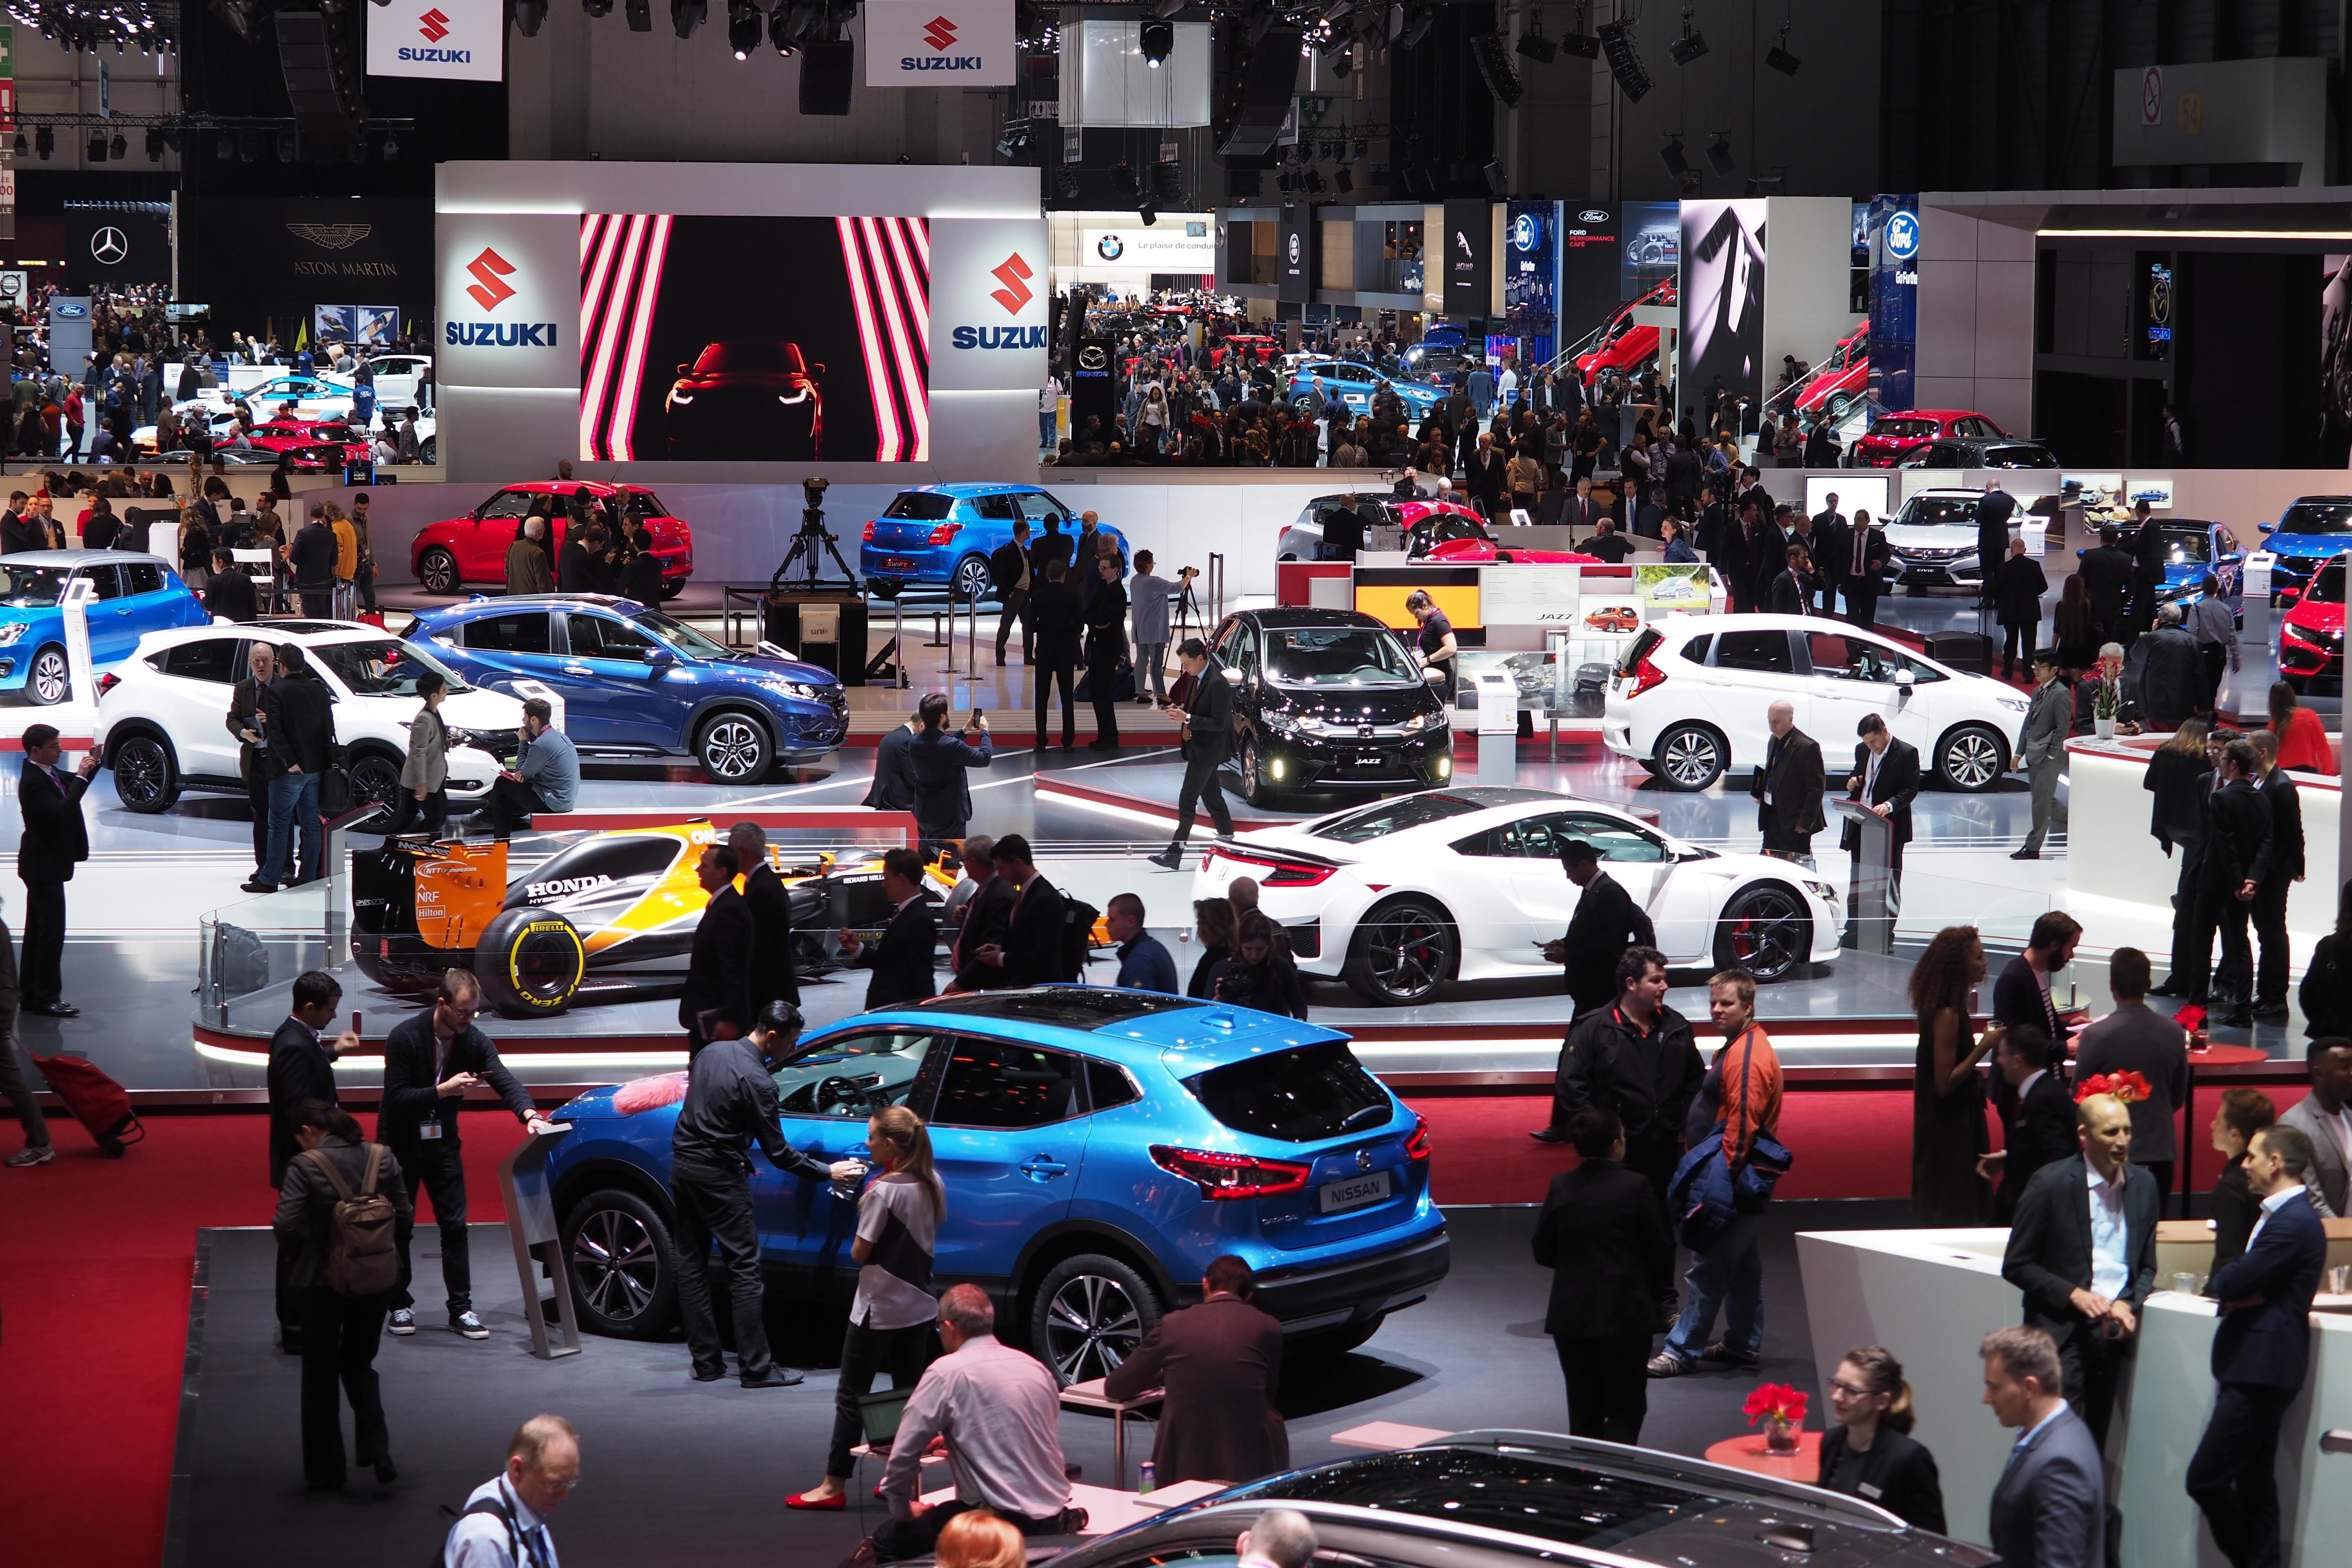 Geneva International Motor Show Report Prestige Online - Luxury car show